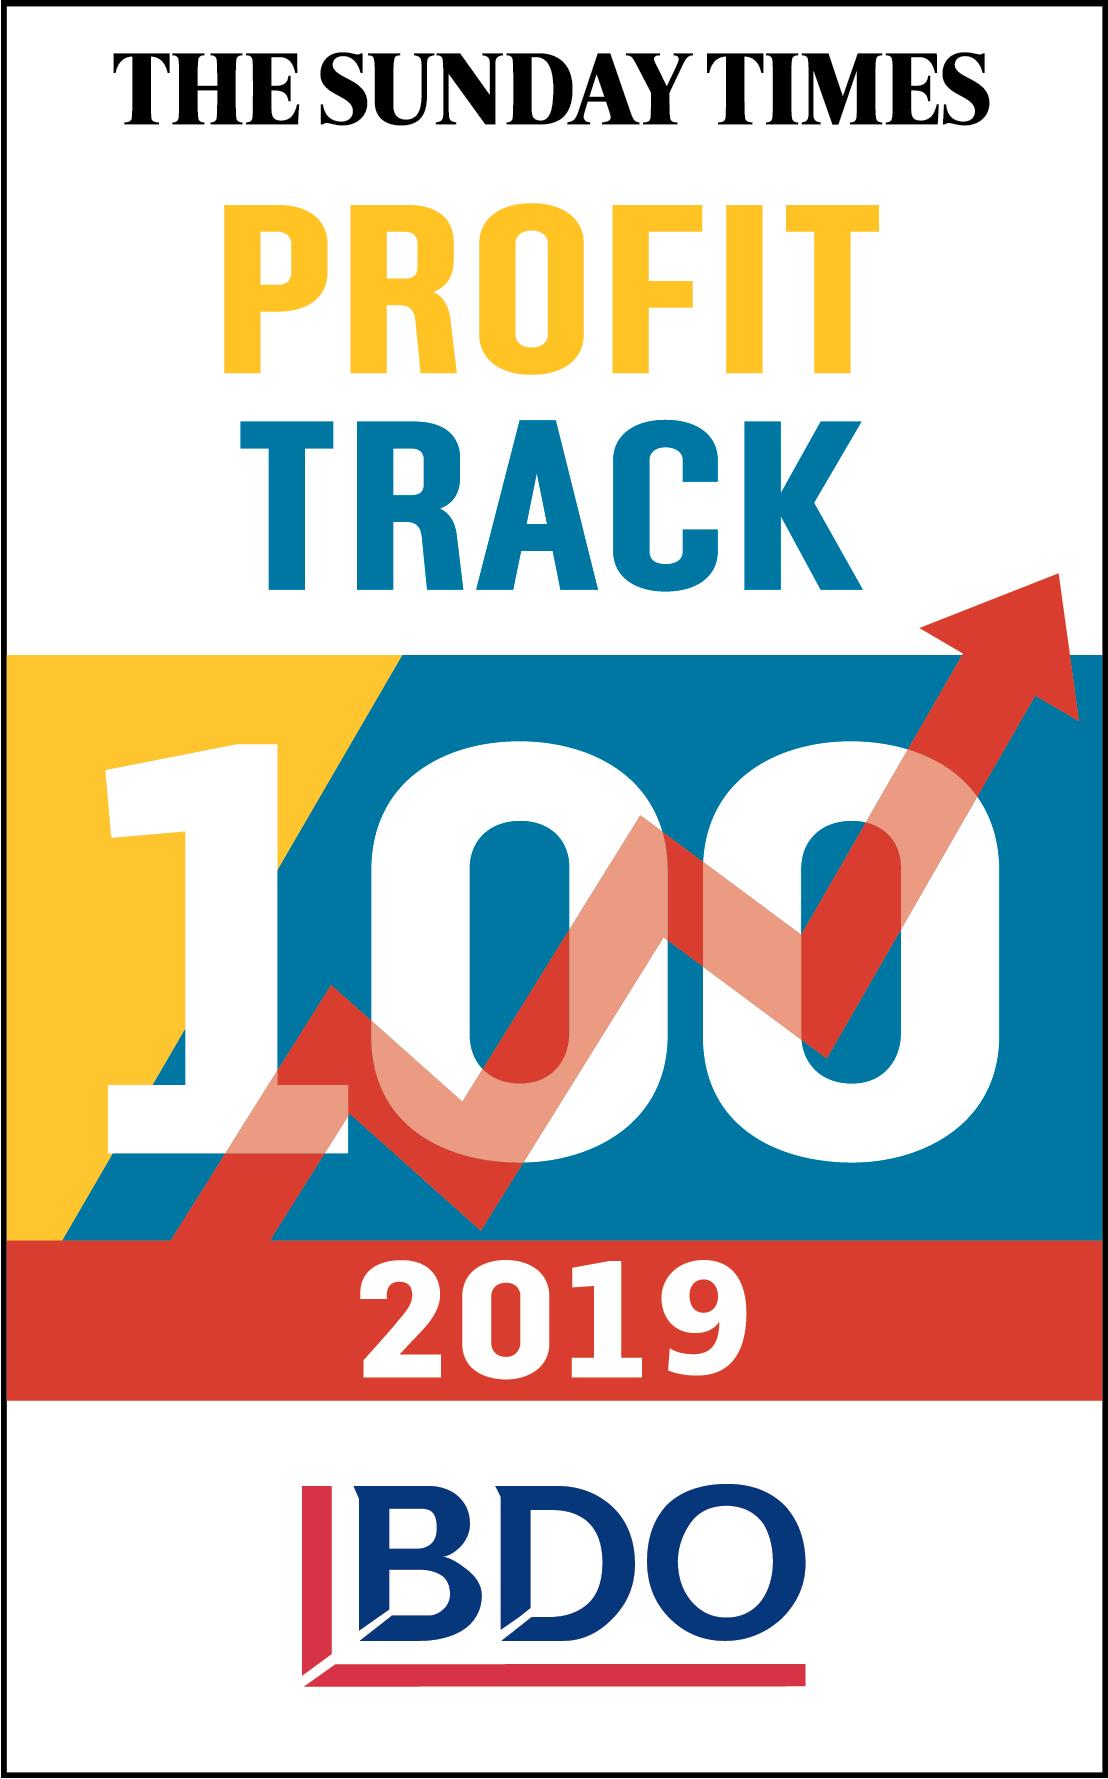 2019 Profit Track 100